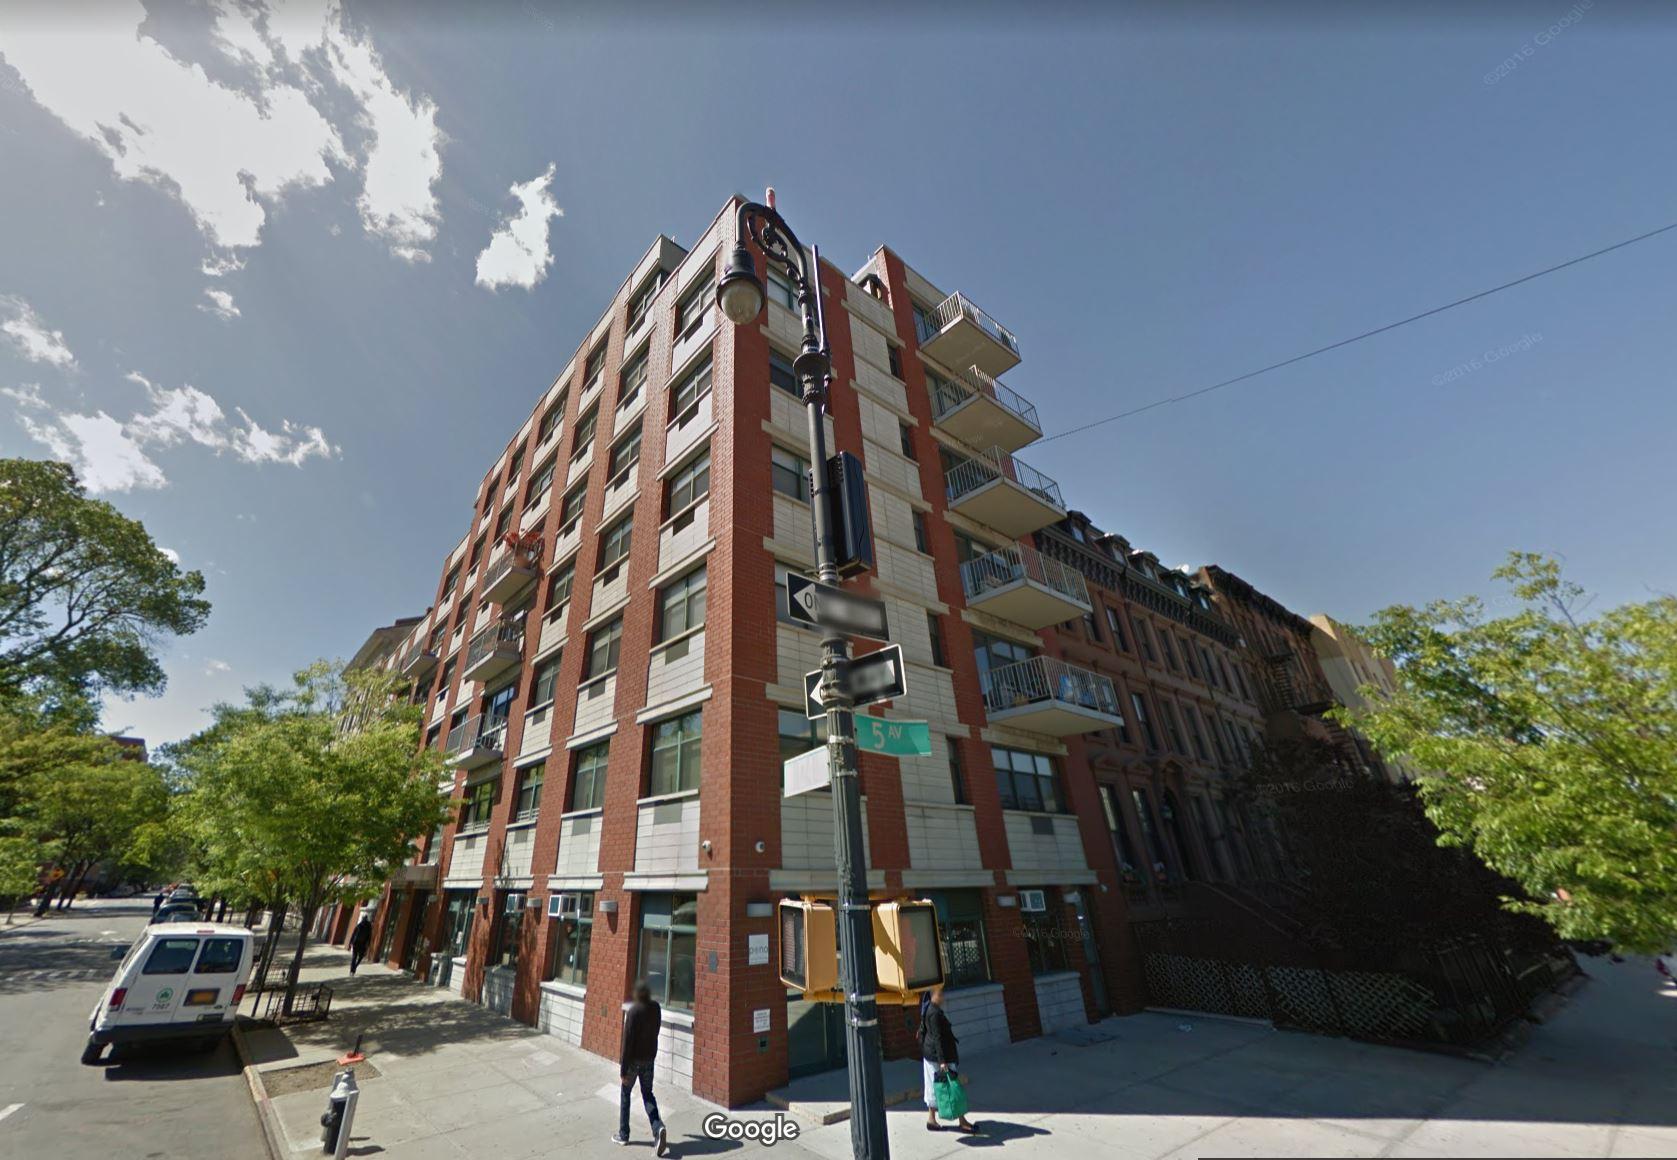 Harlem development site